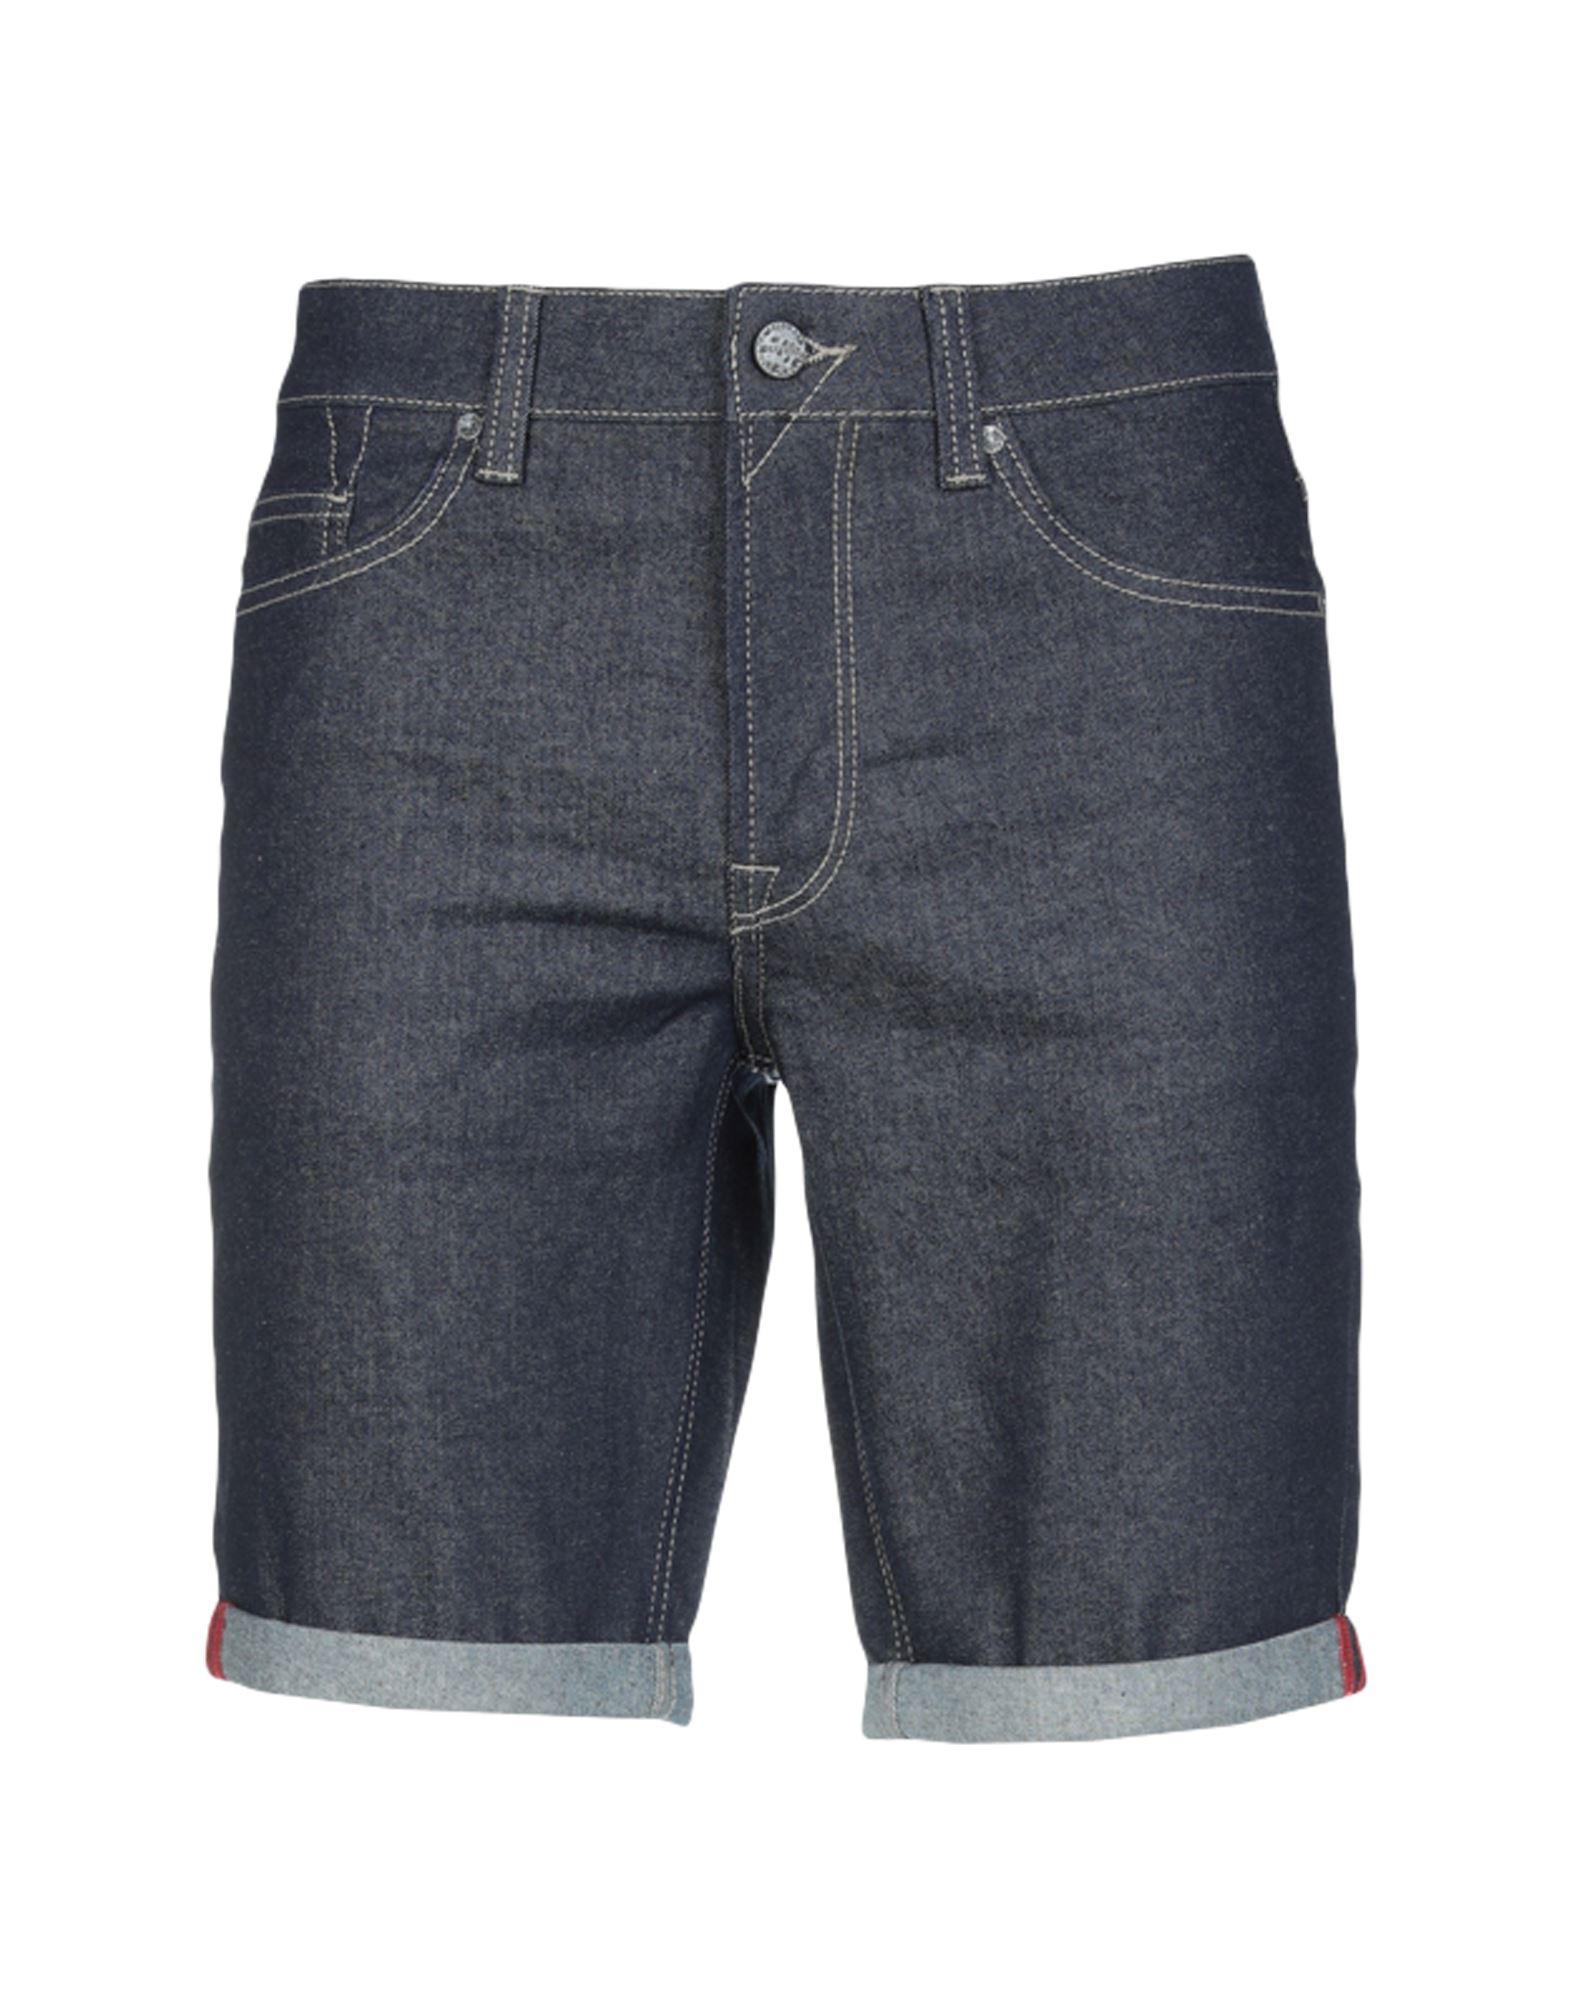 ONLY & SONS Denim shorts - Item 42842163